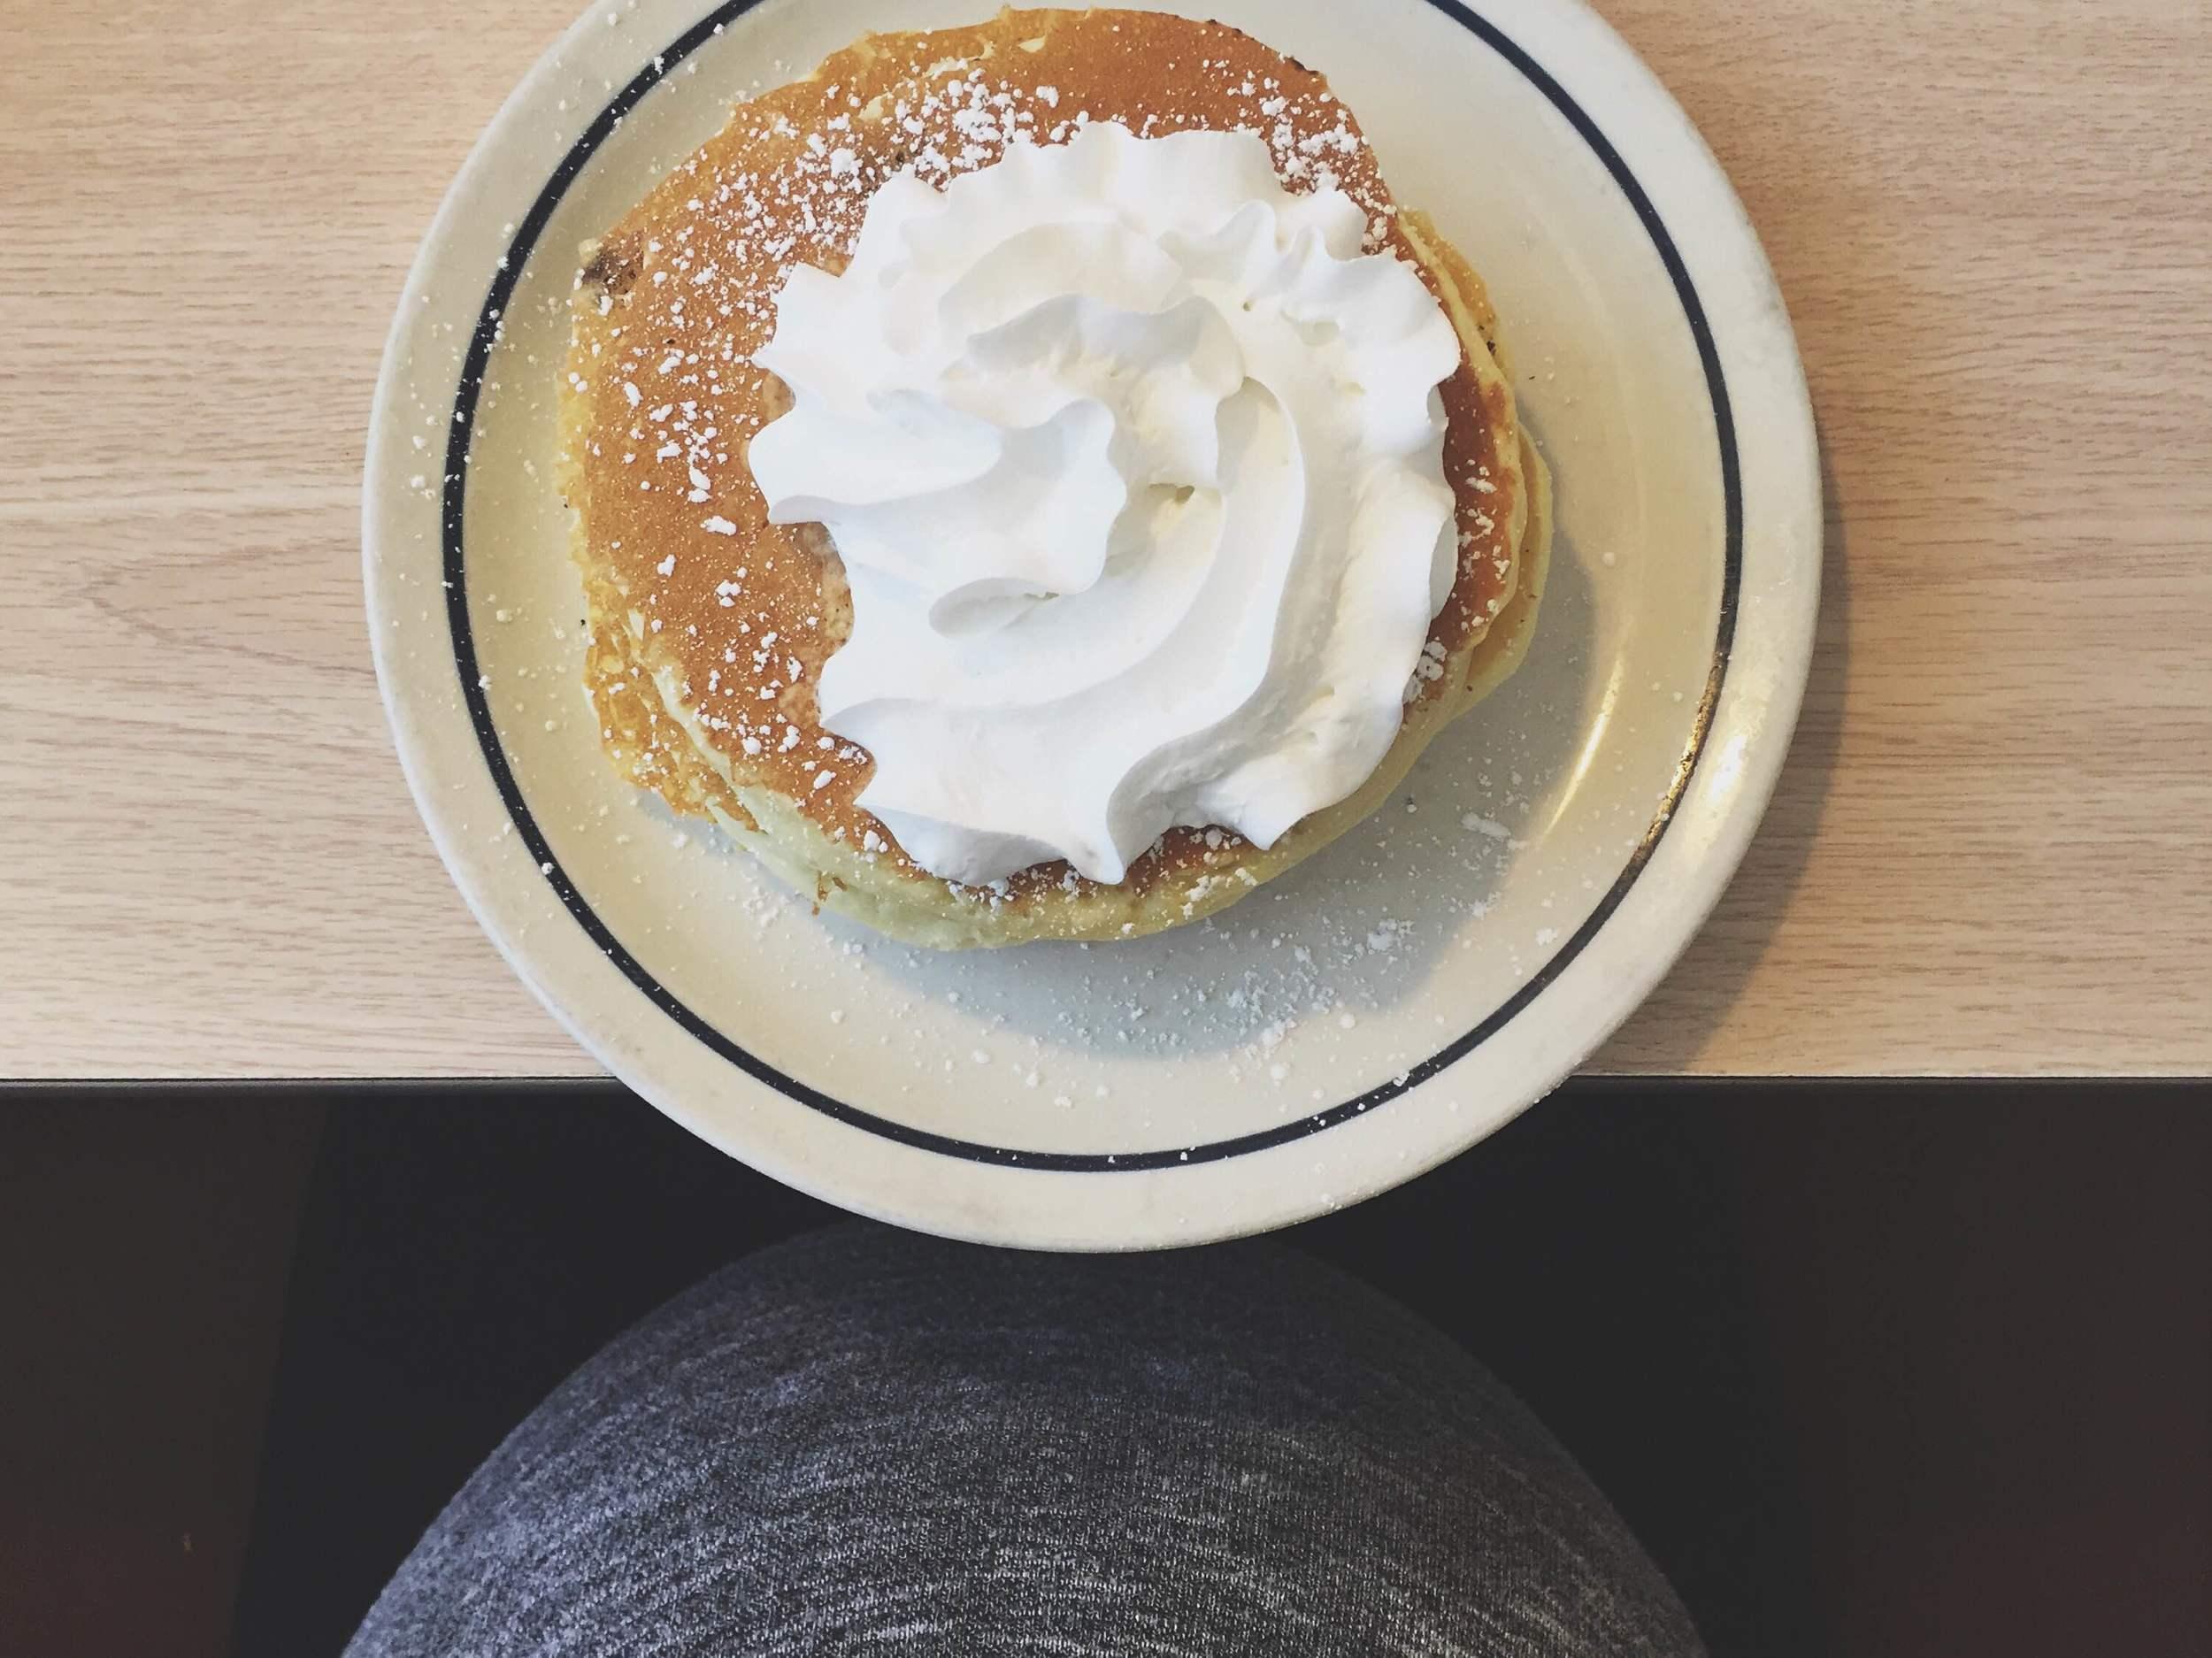 DAY 27- i've got chocolate chip pancakes on my mind.